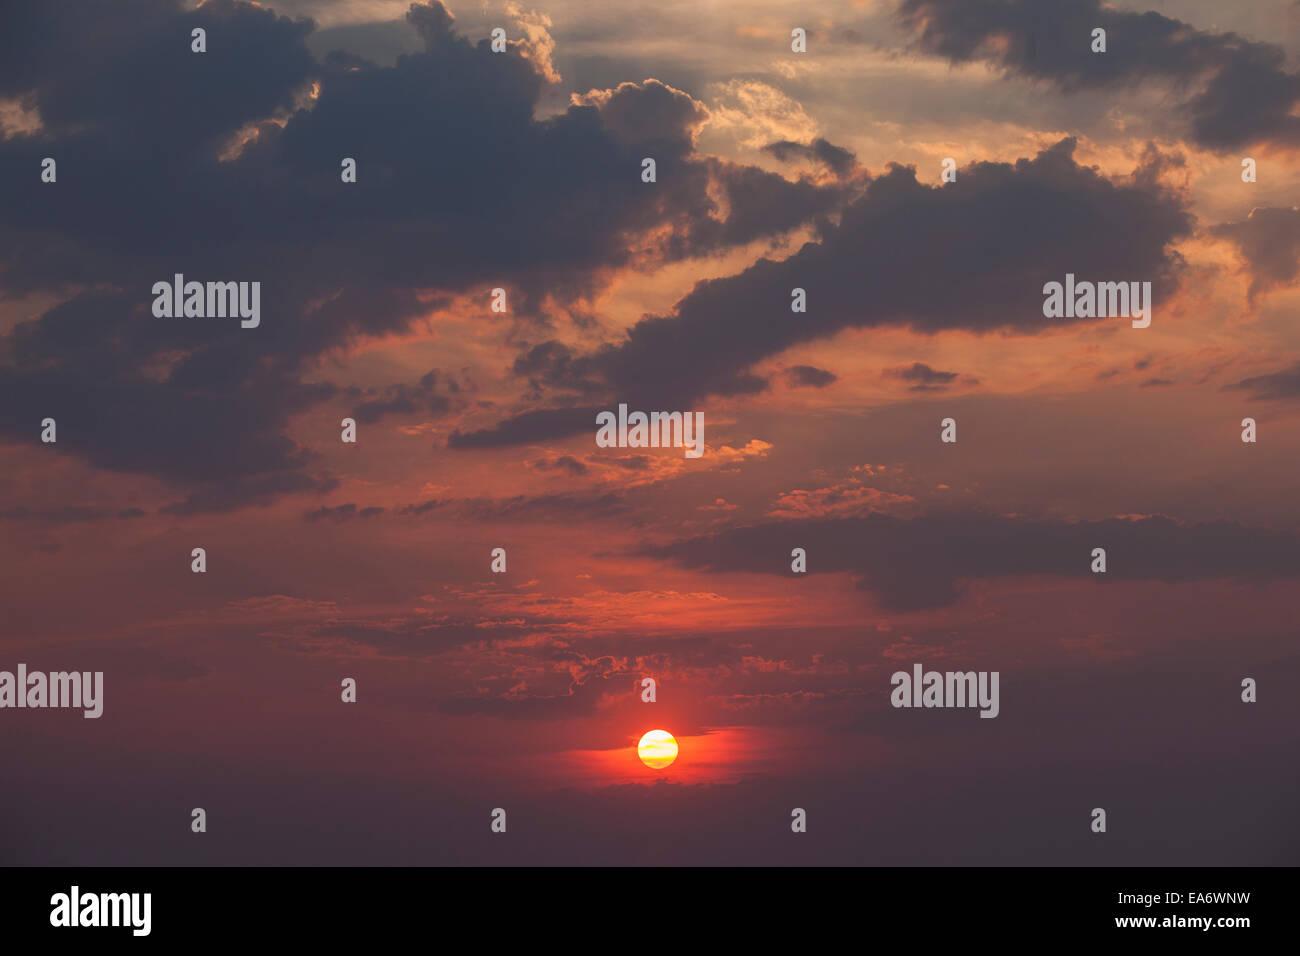 Sunset, Chobe national park, Botswana - Stock Image